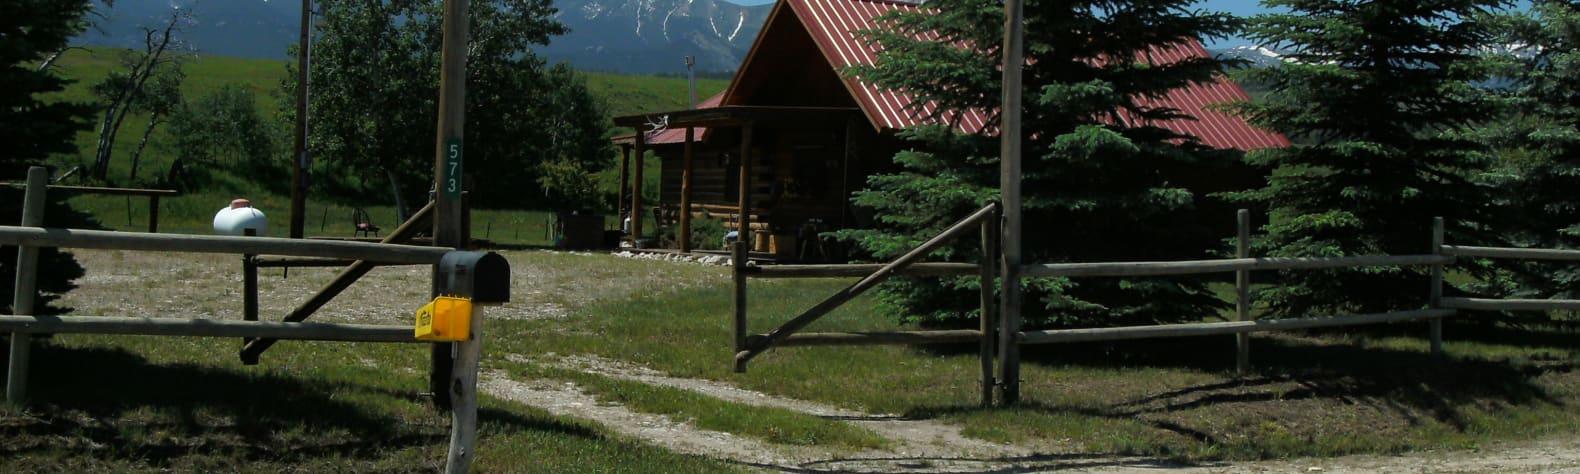 Enchanted Cabin, Stunning Views